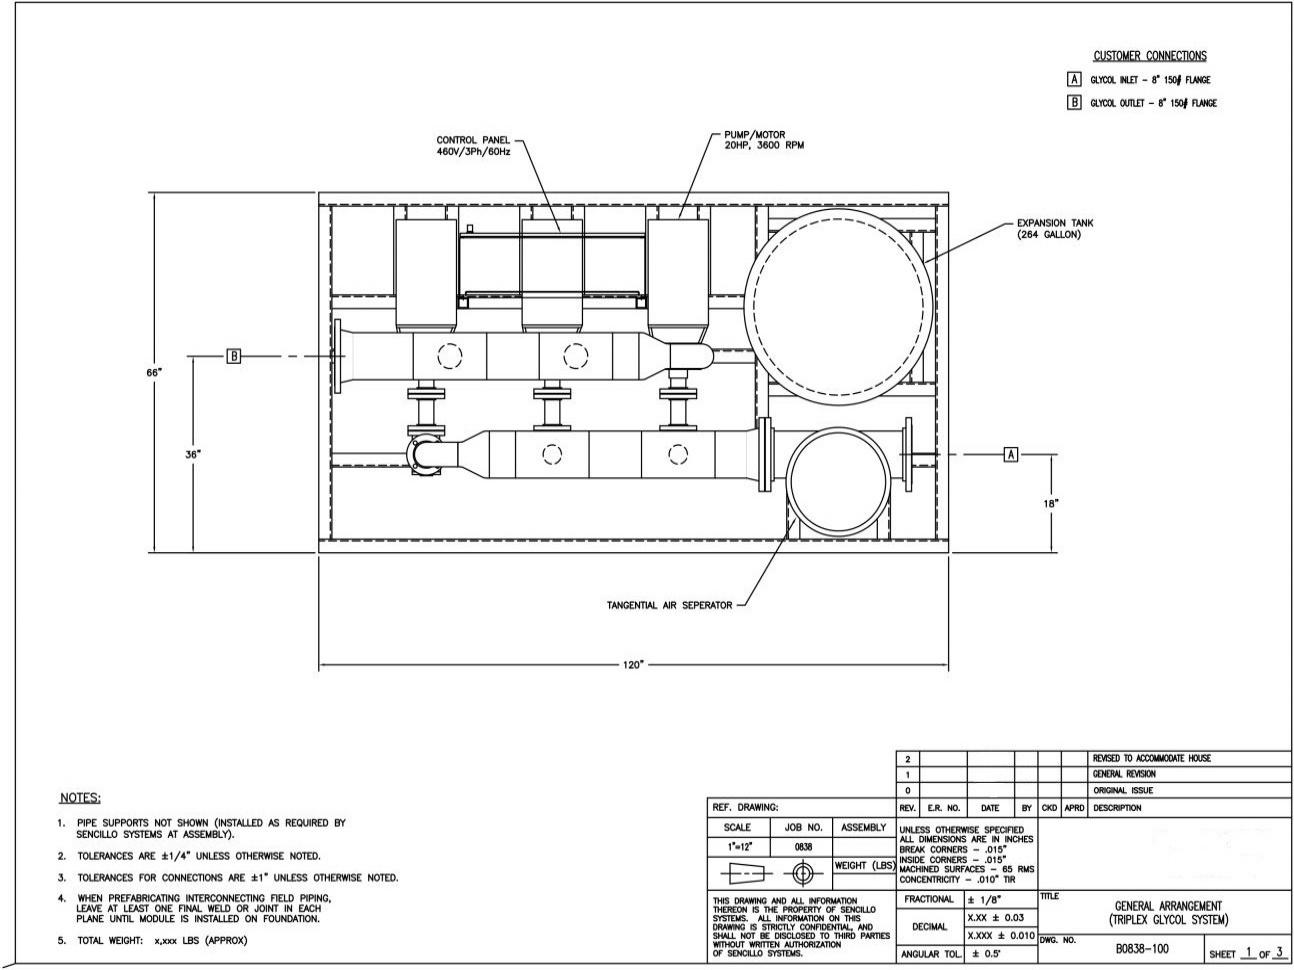 glycol pump system enclosure design